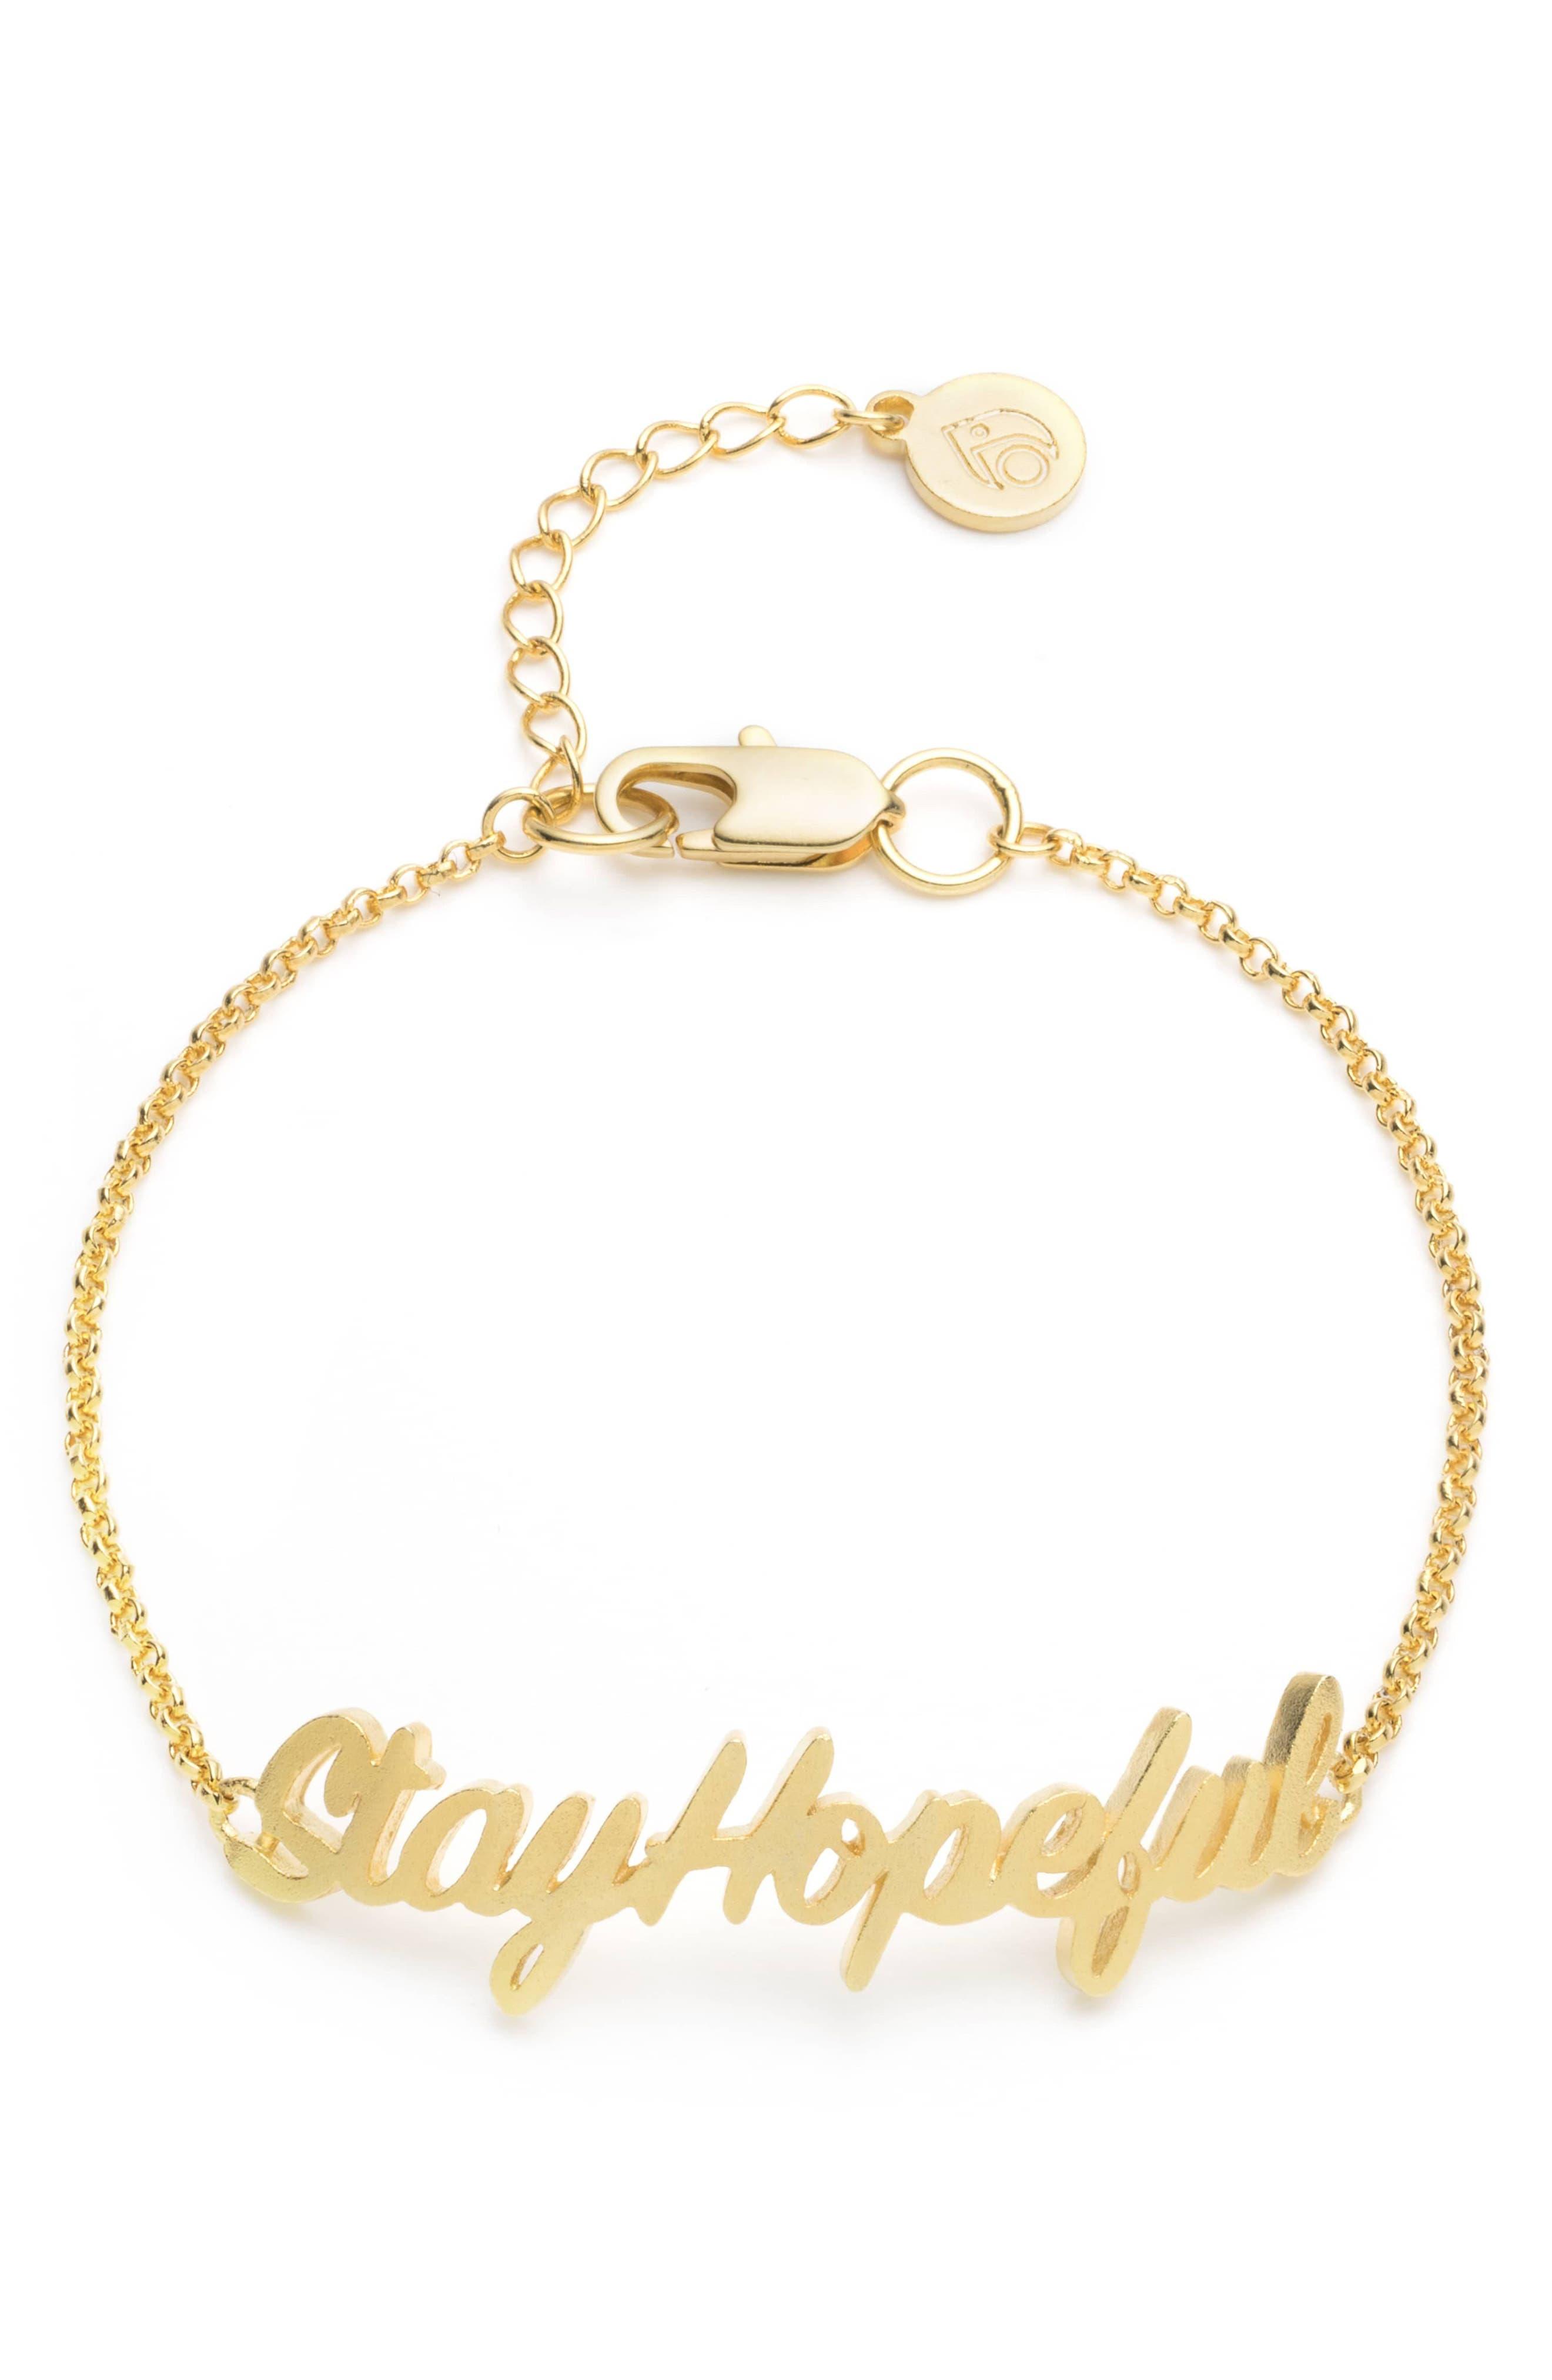 Stay Hopeful Bracelet,                             Main thumbnail 1, color,                             Gold